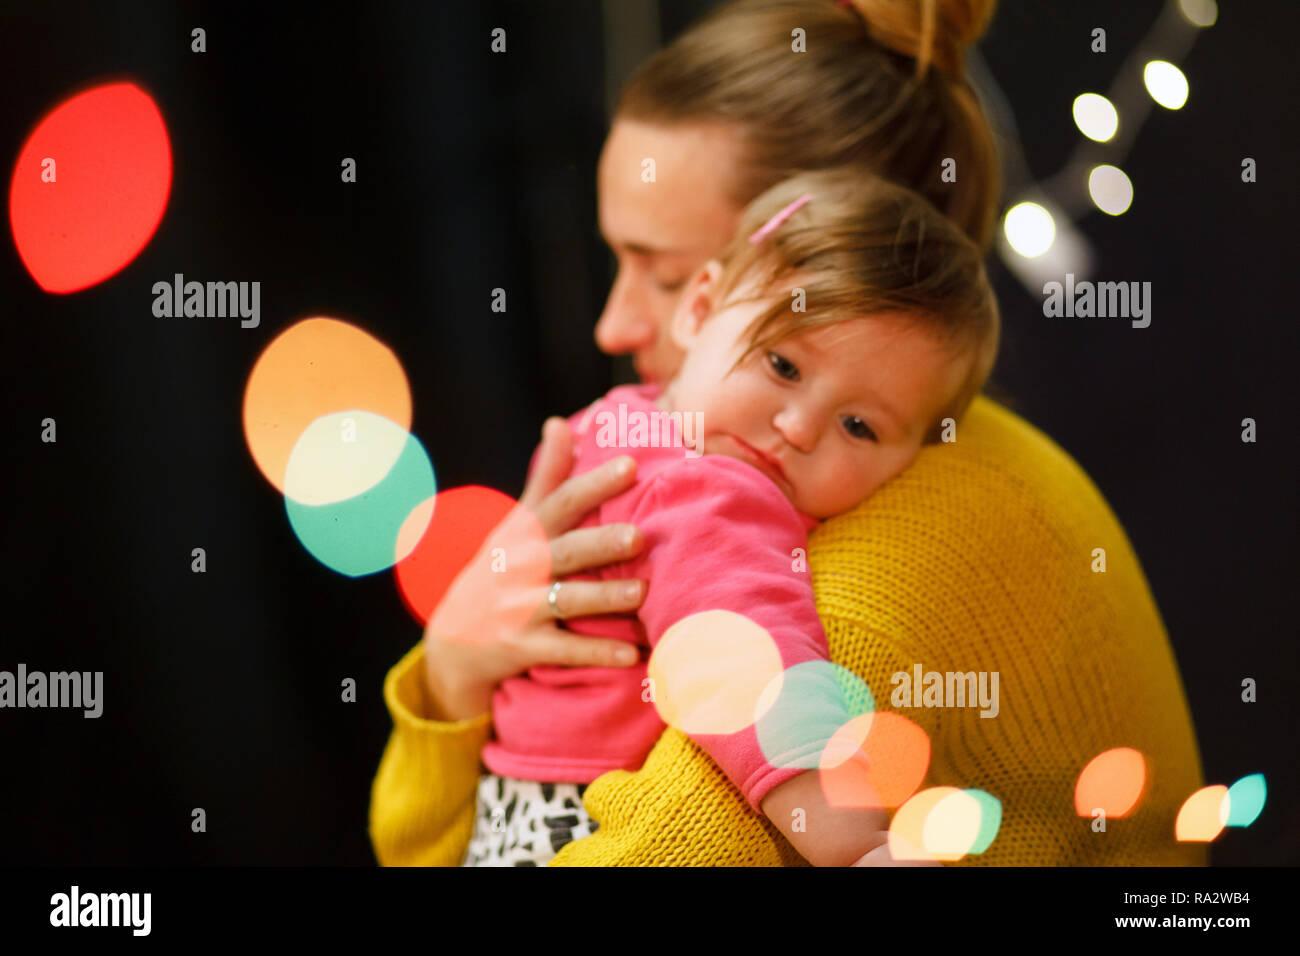 Mother hugs a little girl who cries. Maternal love. Soft focus - Stock Image